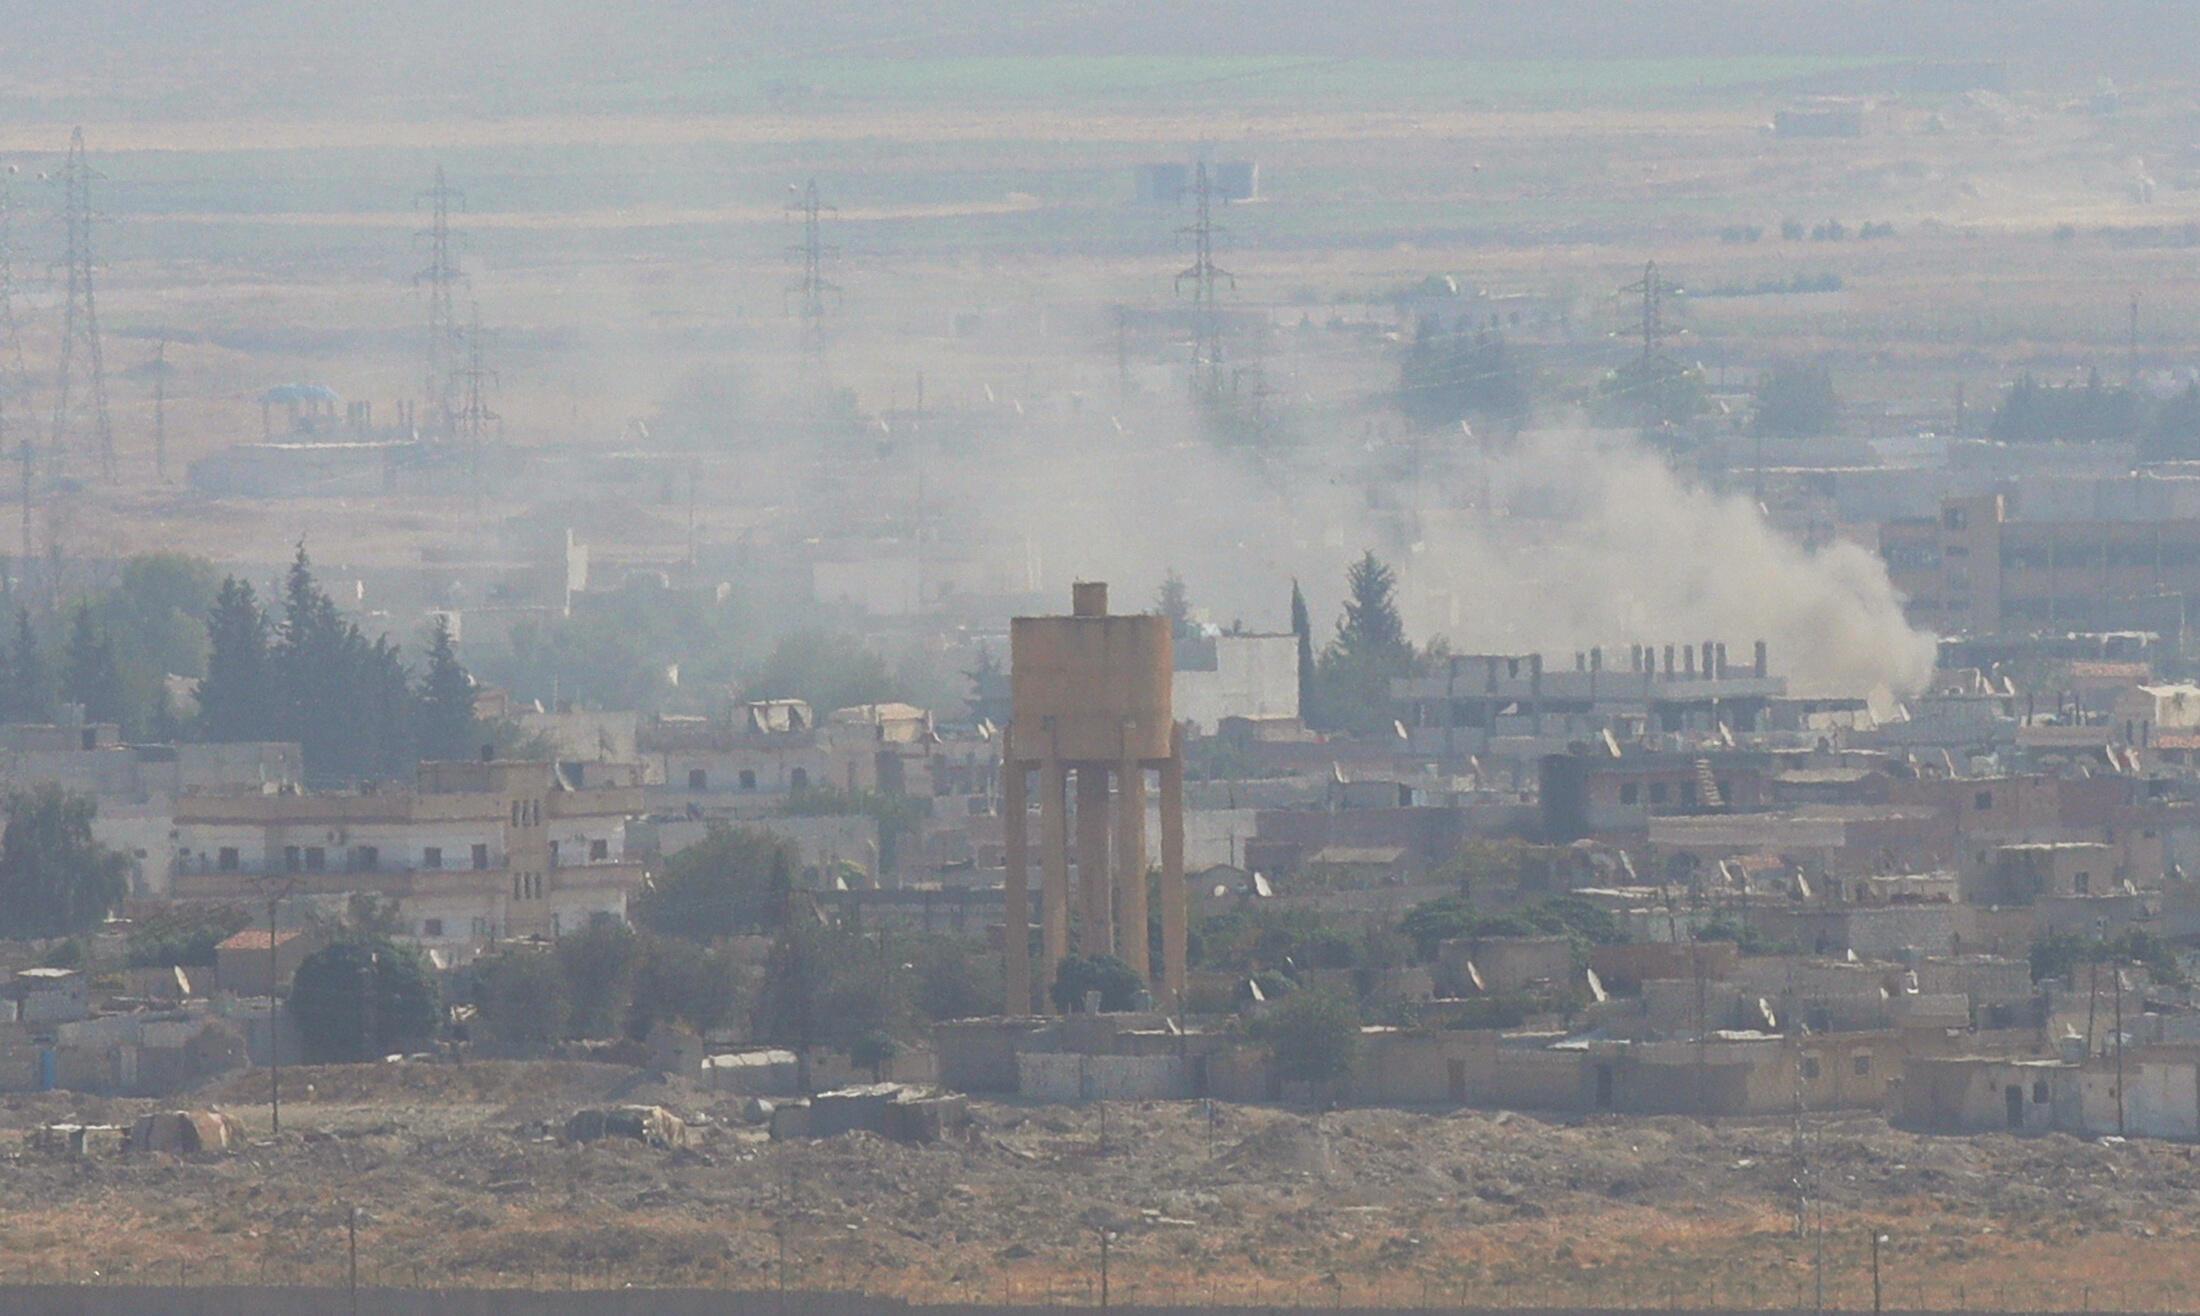 L'aviation turque a bombardé à l'est de Ras al-Ain en territoire syrien, le 18 octobre 2019.